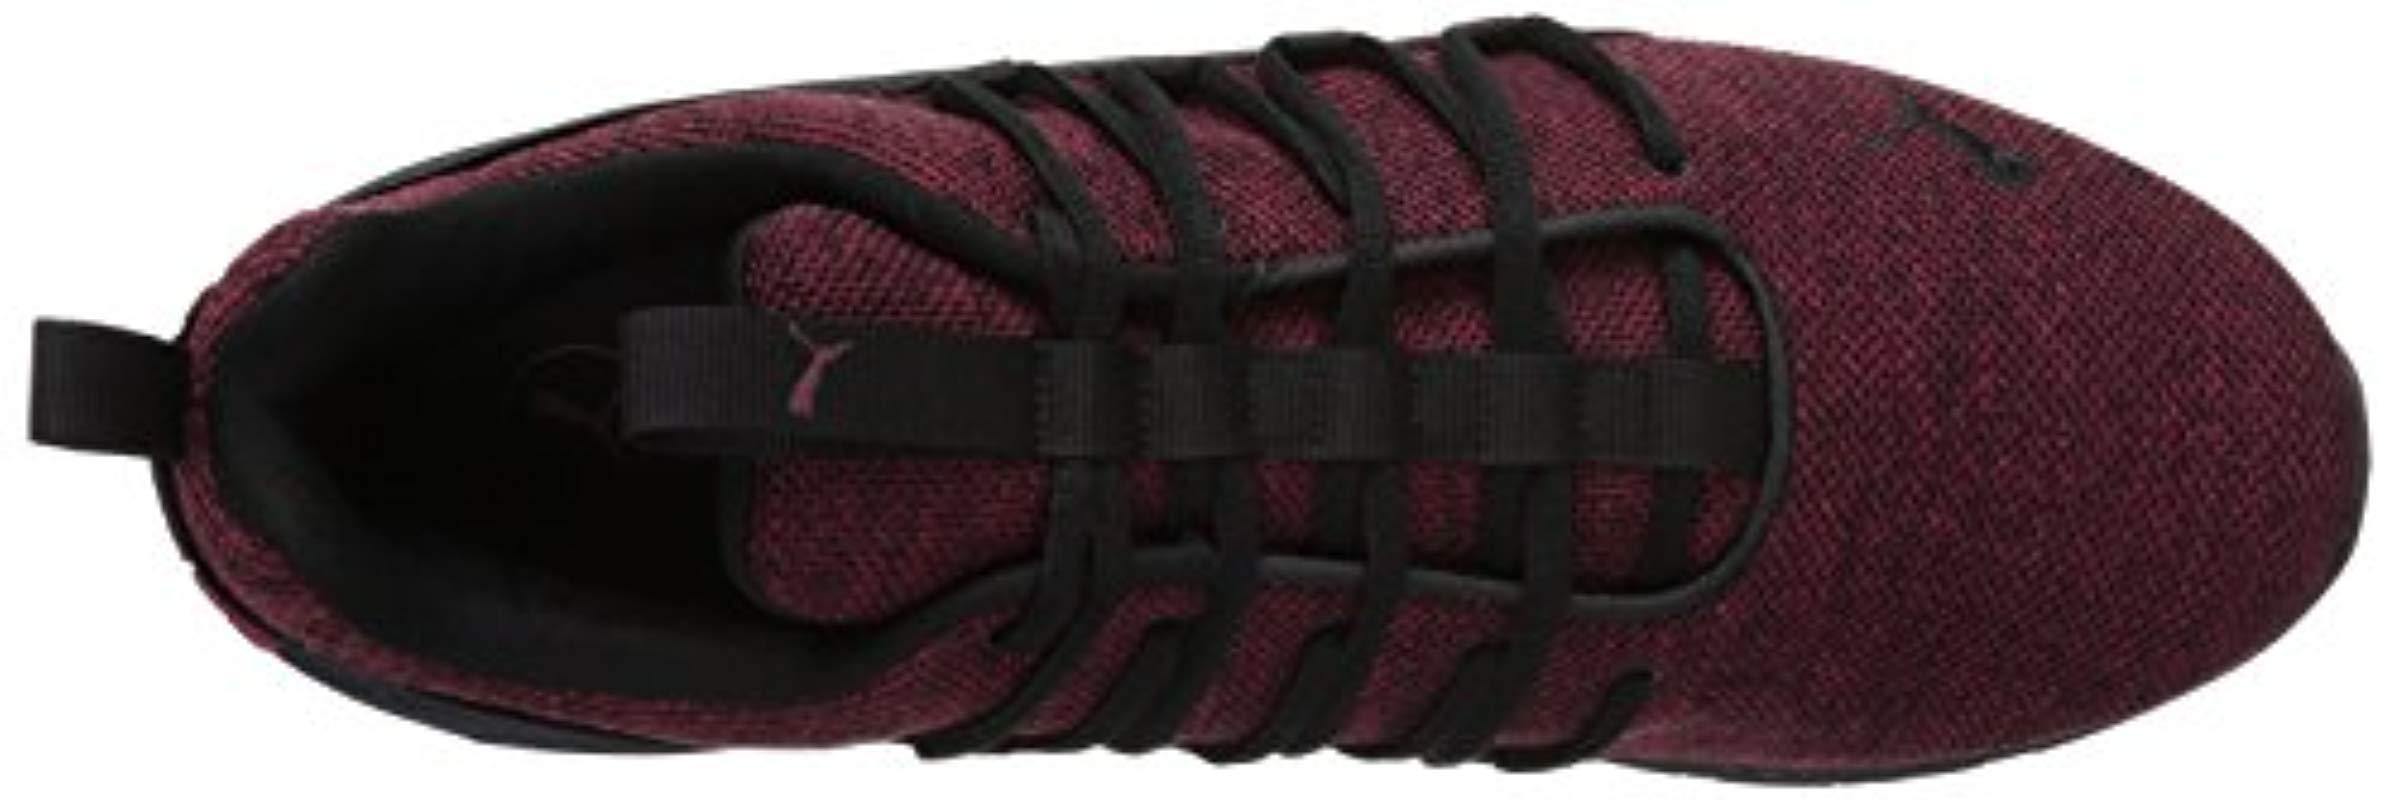 ec8a82605e41 ... PUMA - Multicolor Axelion Sneaker for Men - Lyst. View fullscreen  popular stores 660b7 b6758 ...